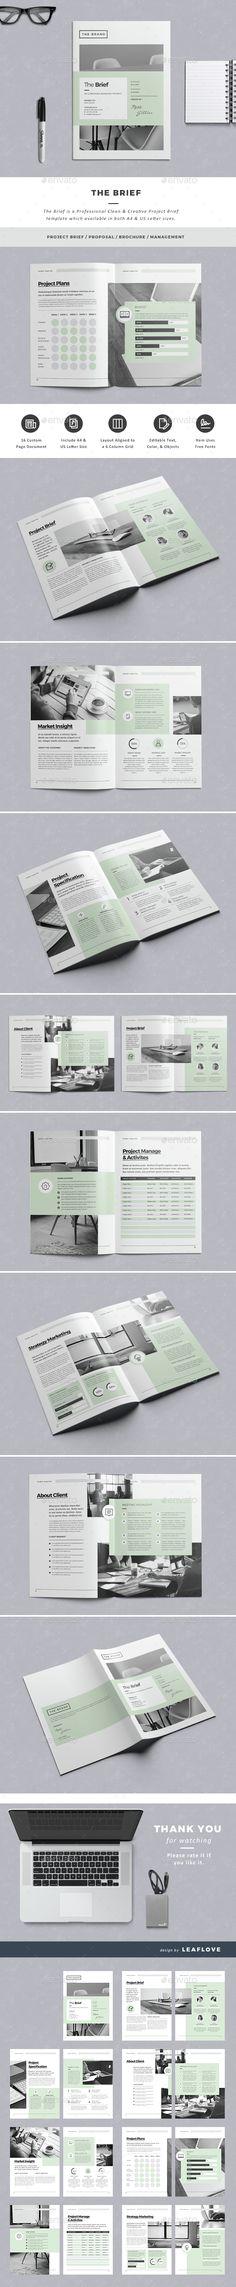 The Brief - Informational Brochures